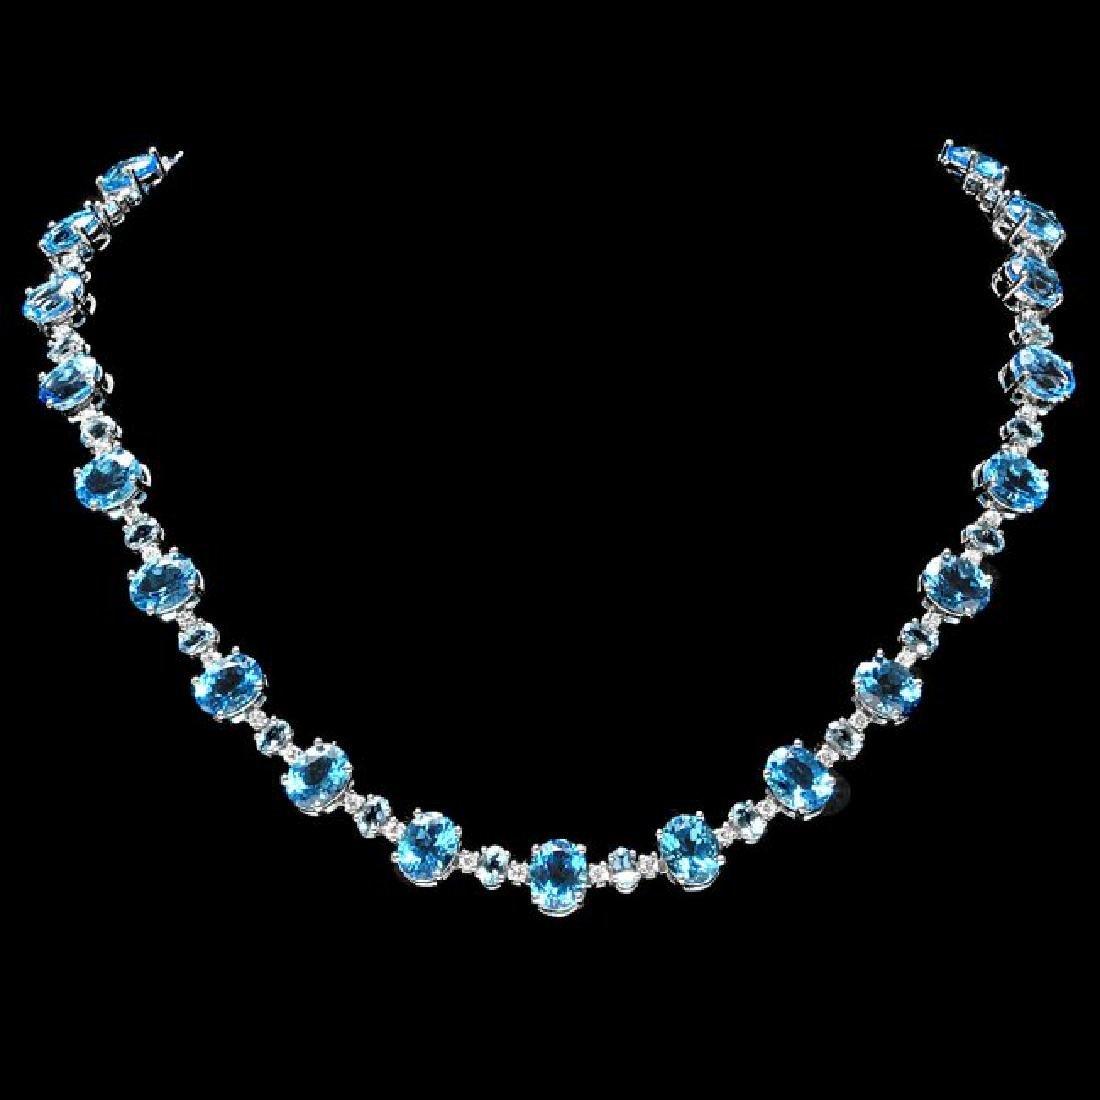 14k Gold 60.00ct Topaz 2.35ct Diamond Necklace